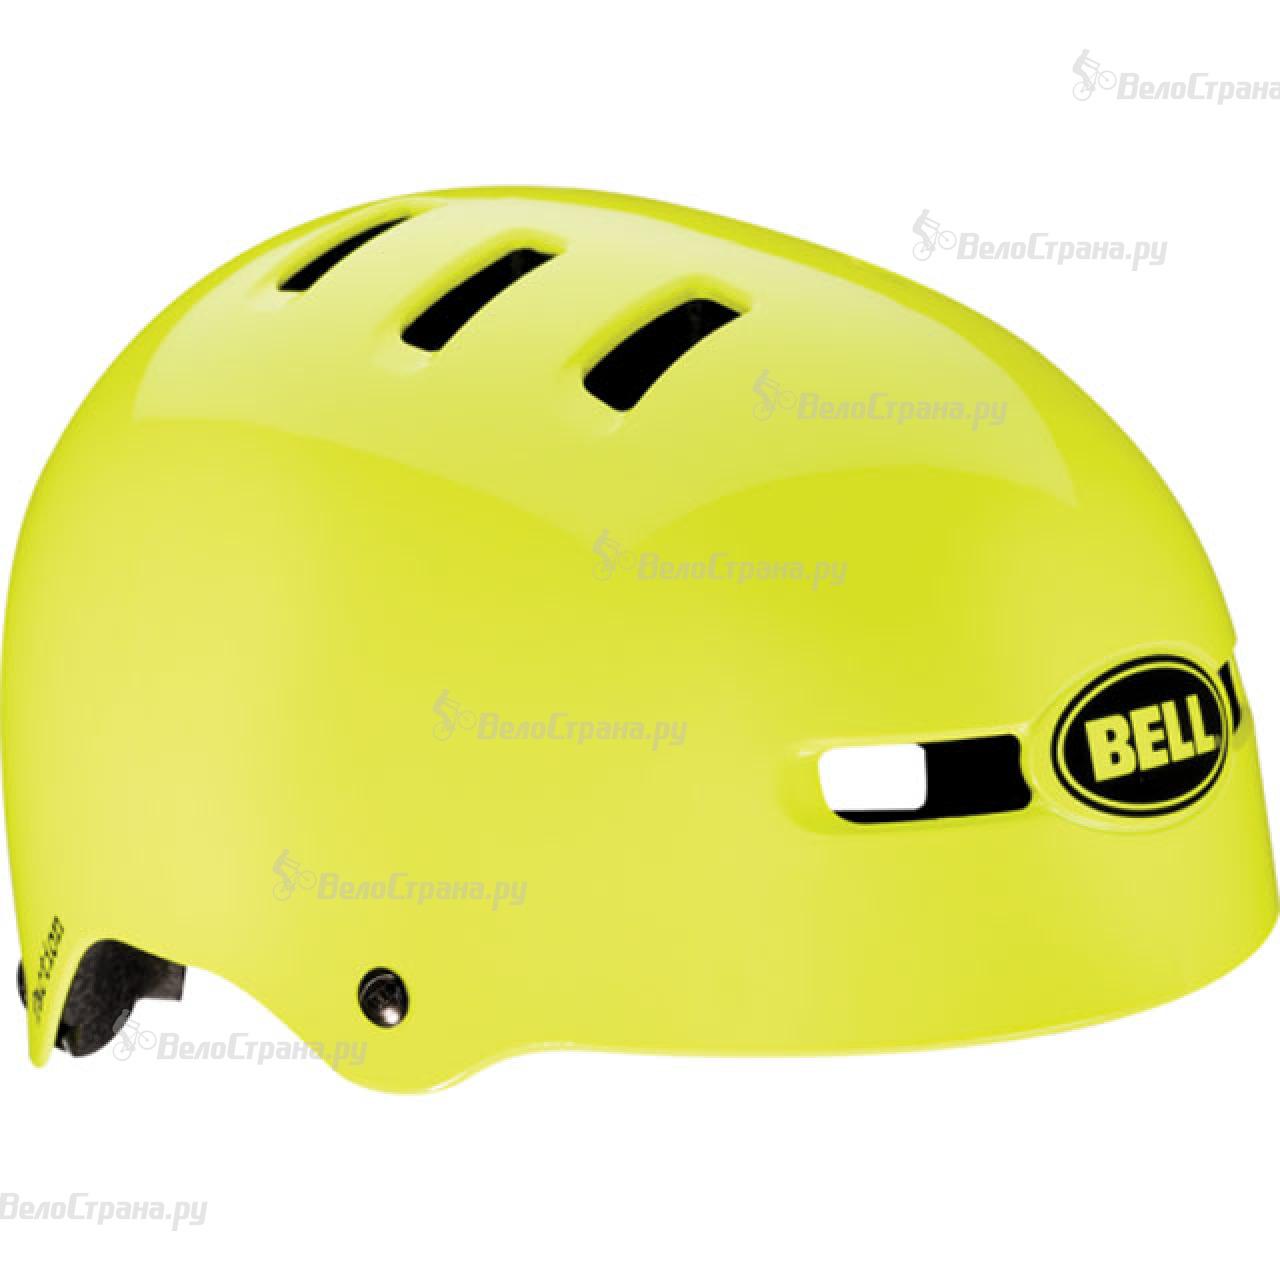 Helmets  Powersports  Bell Helmets